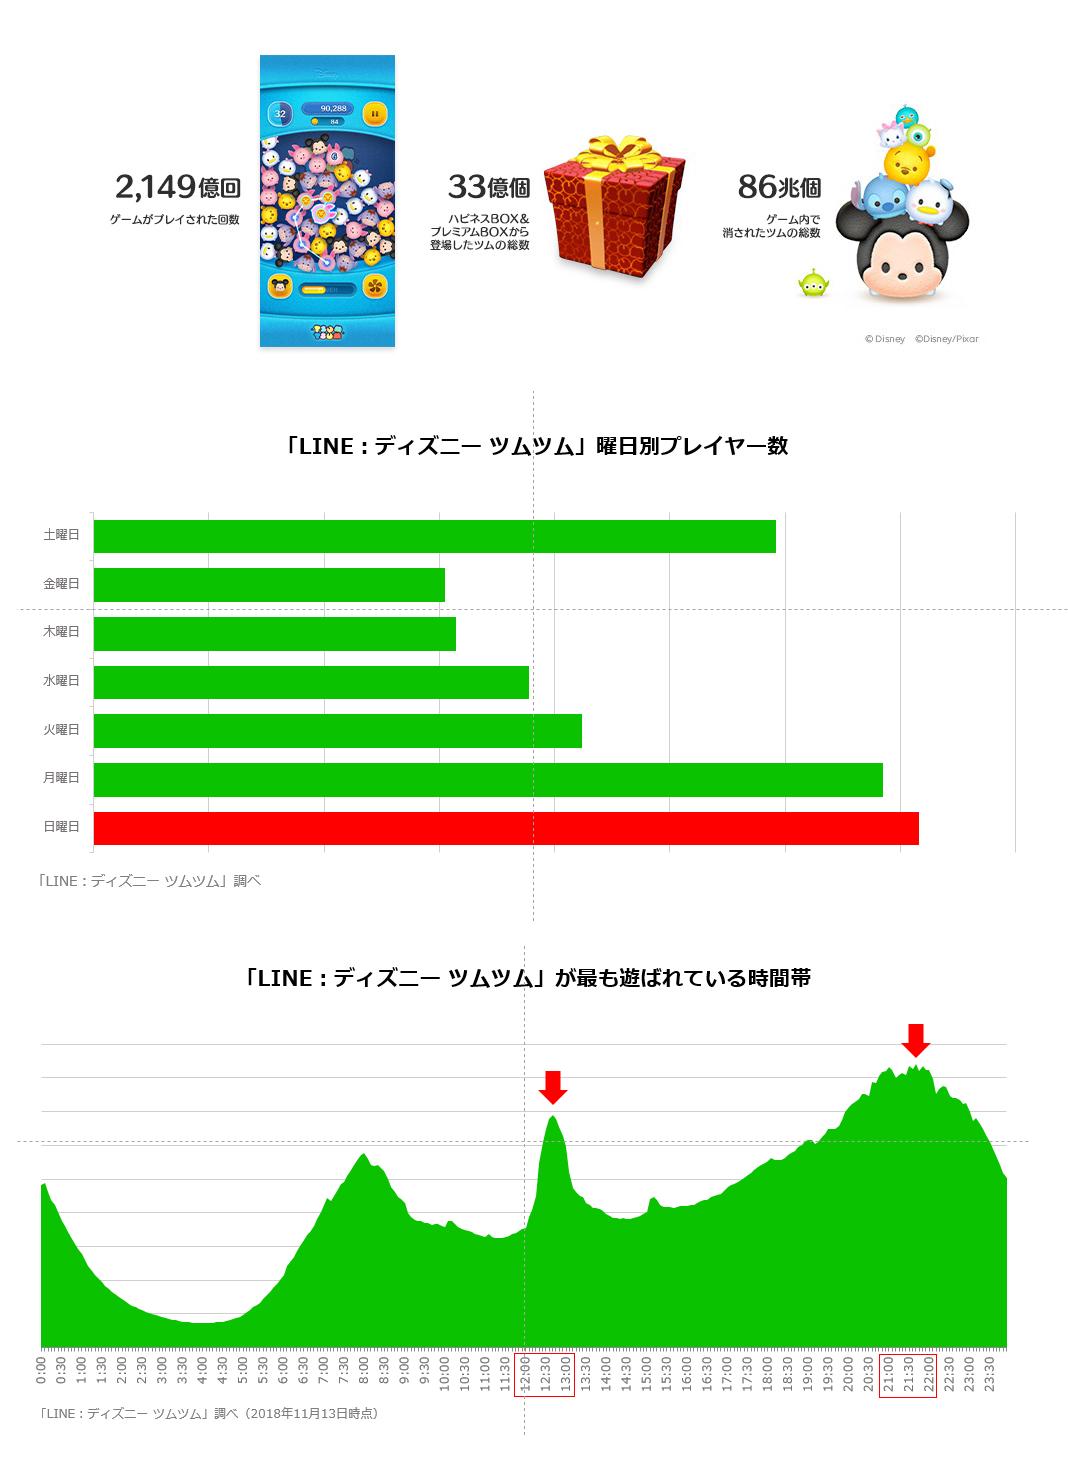 /stf/linecorp/ja/pr/TsumTsum_80millionDL_Fact.png